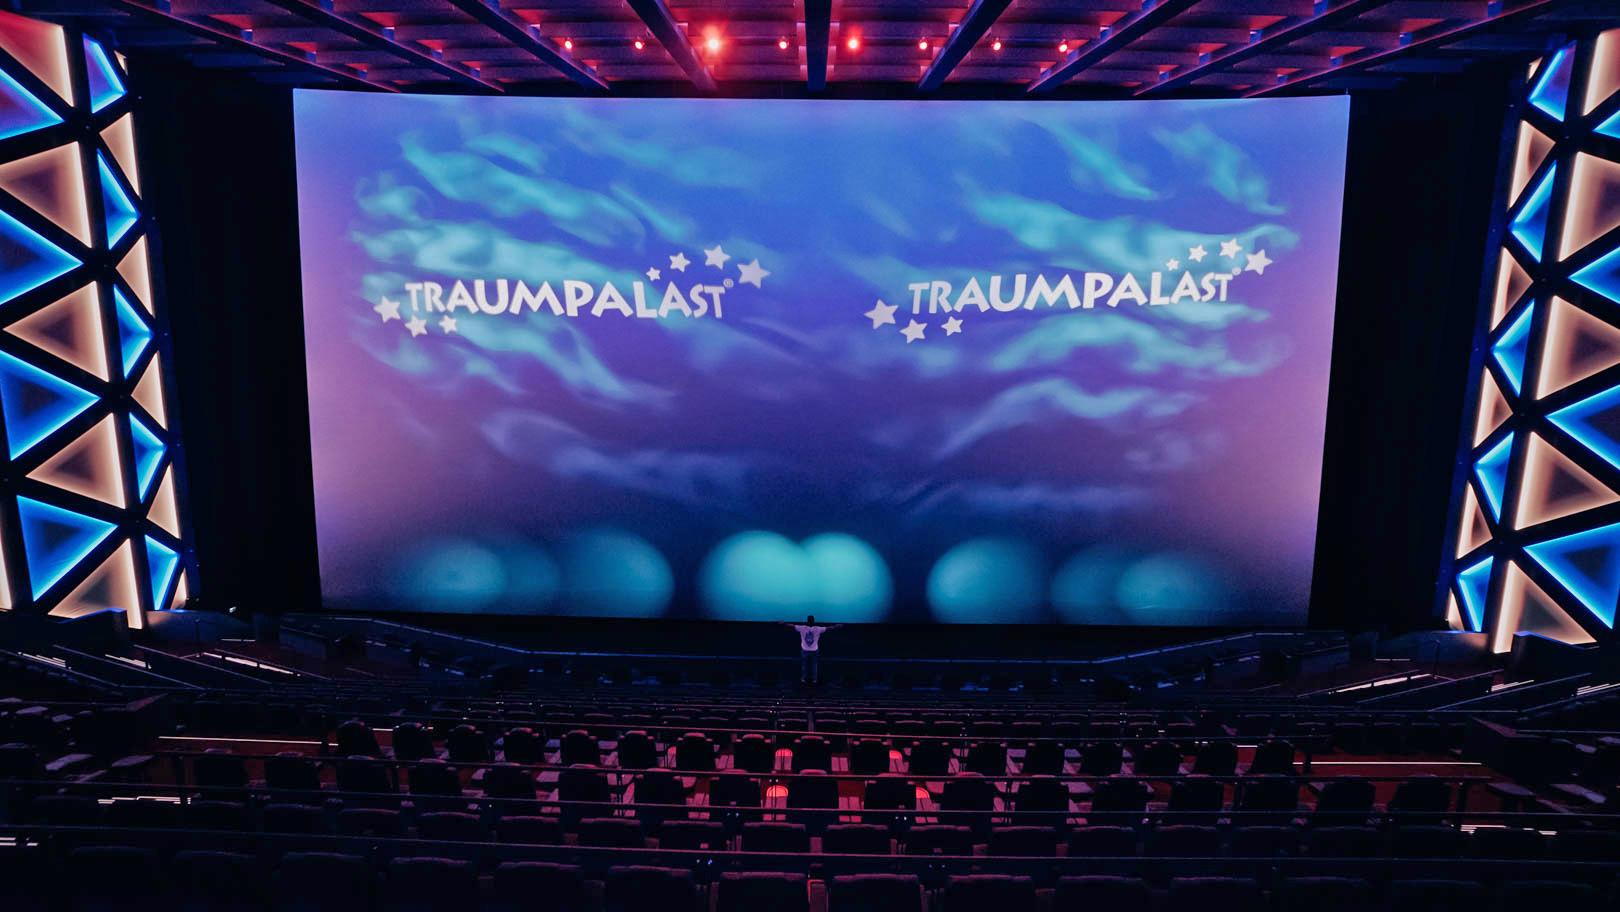 IMAX Leonberg